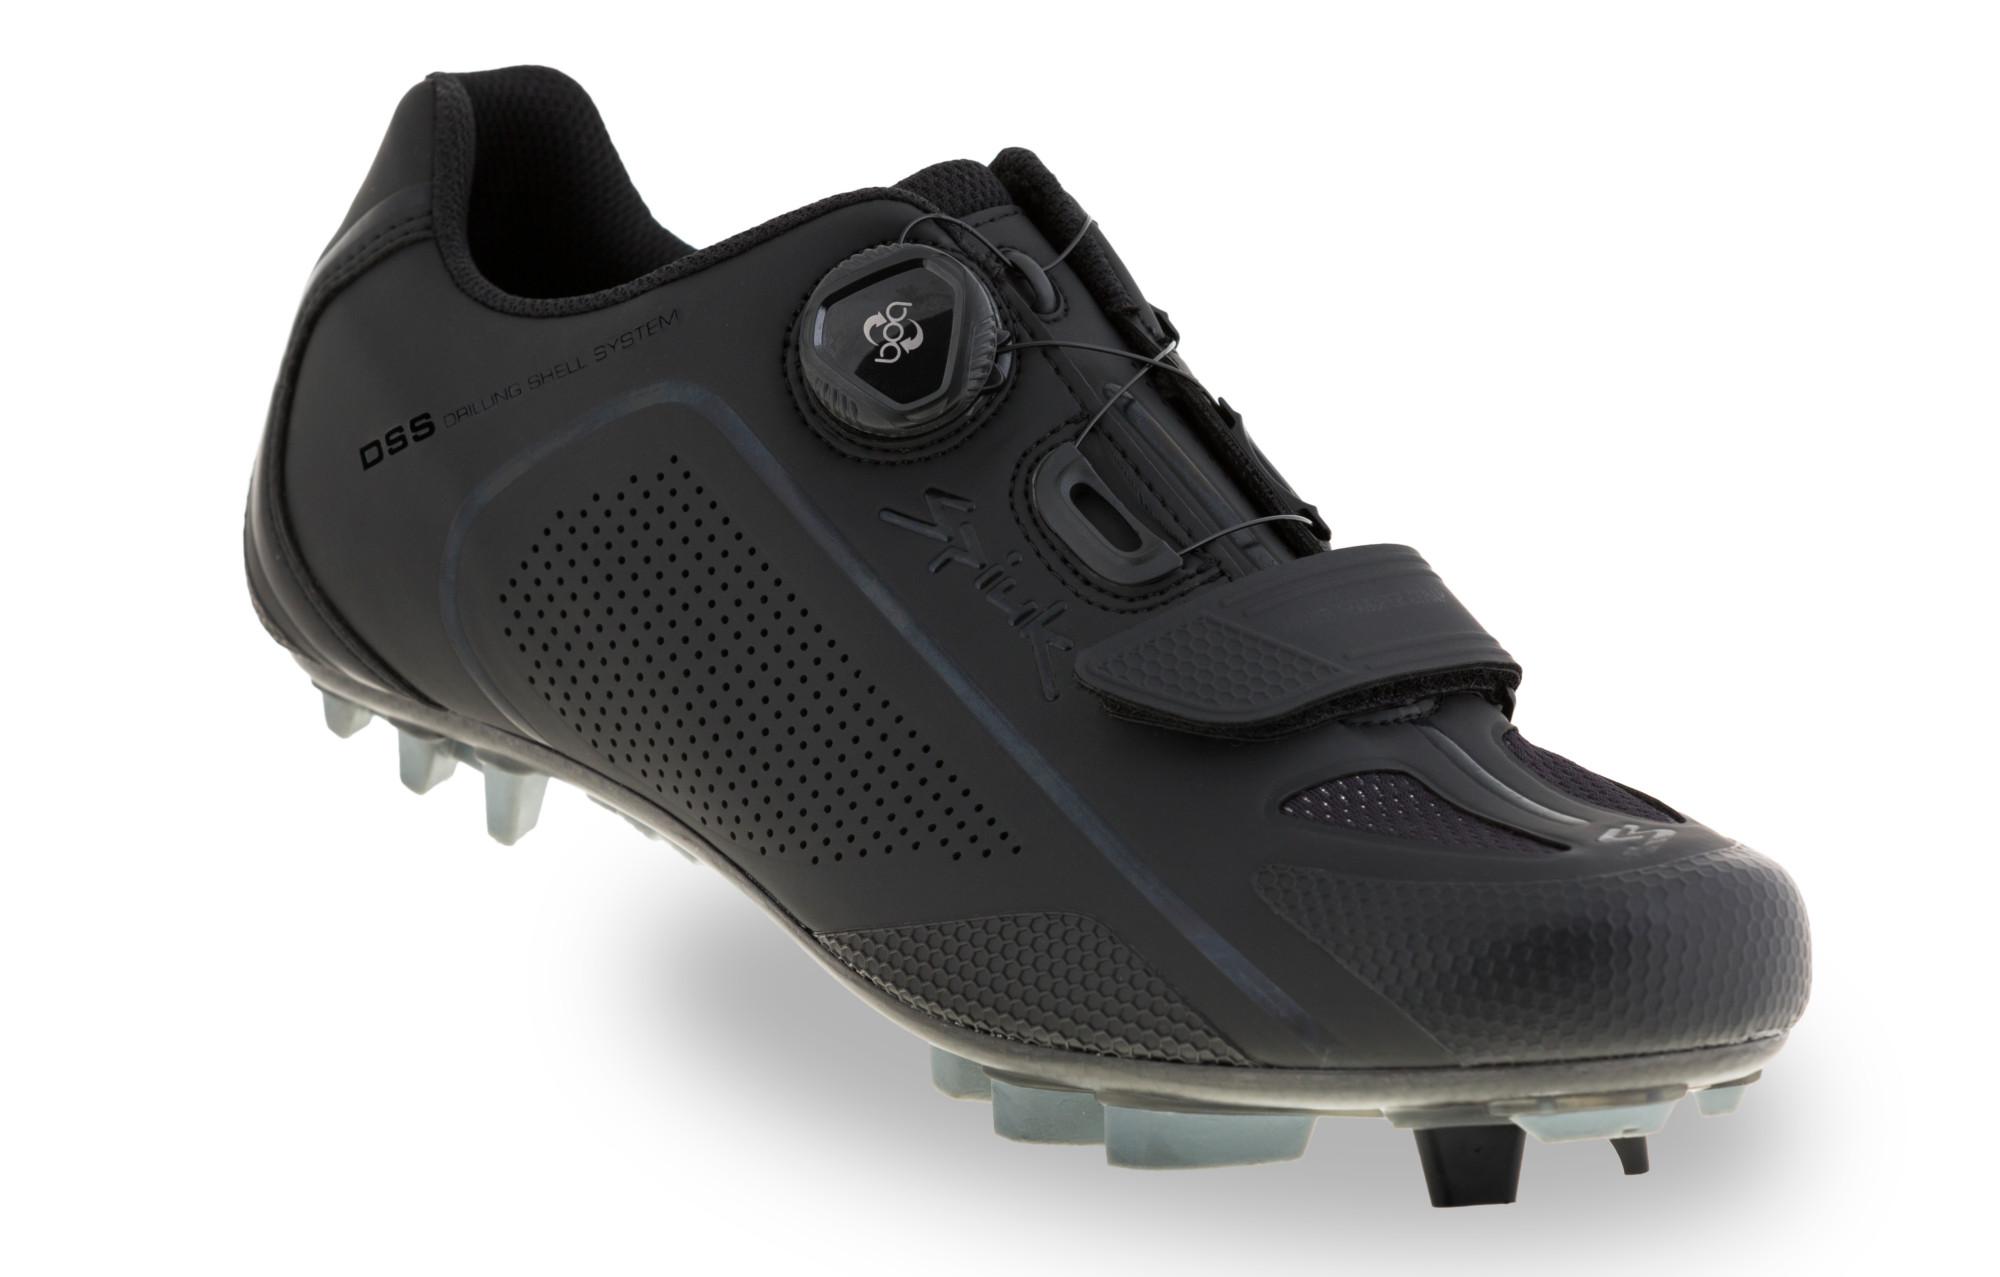 9dd8cf58072 Chaussures VTT Spiuk Altube MC Noir